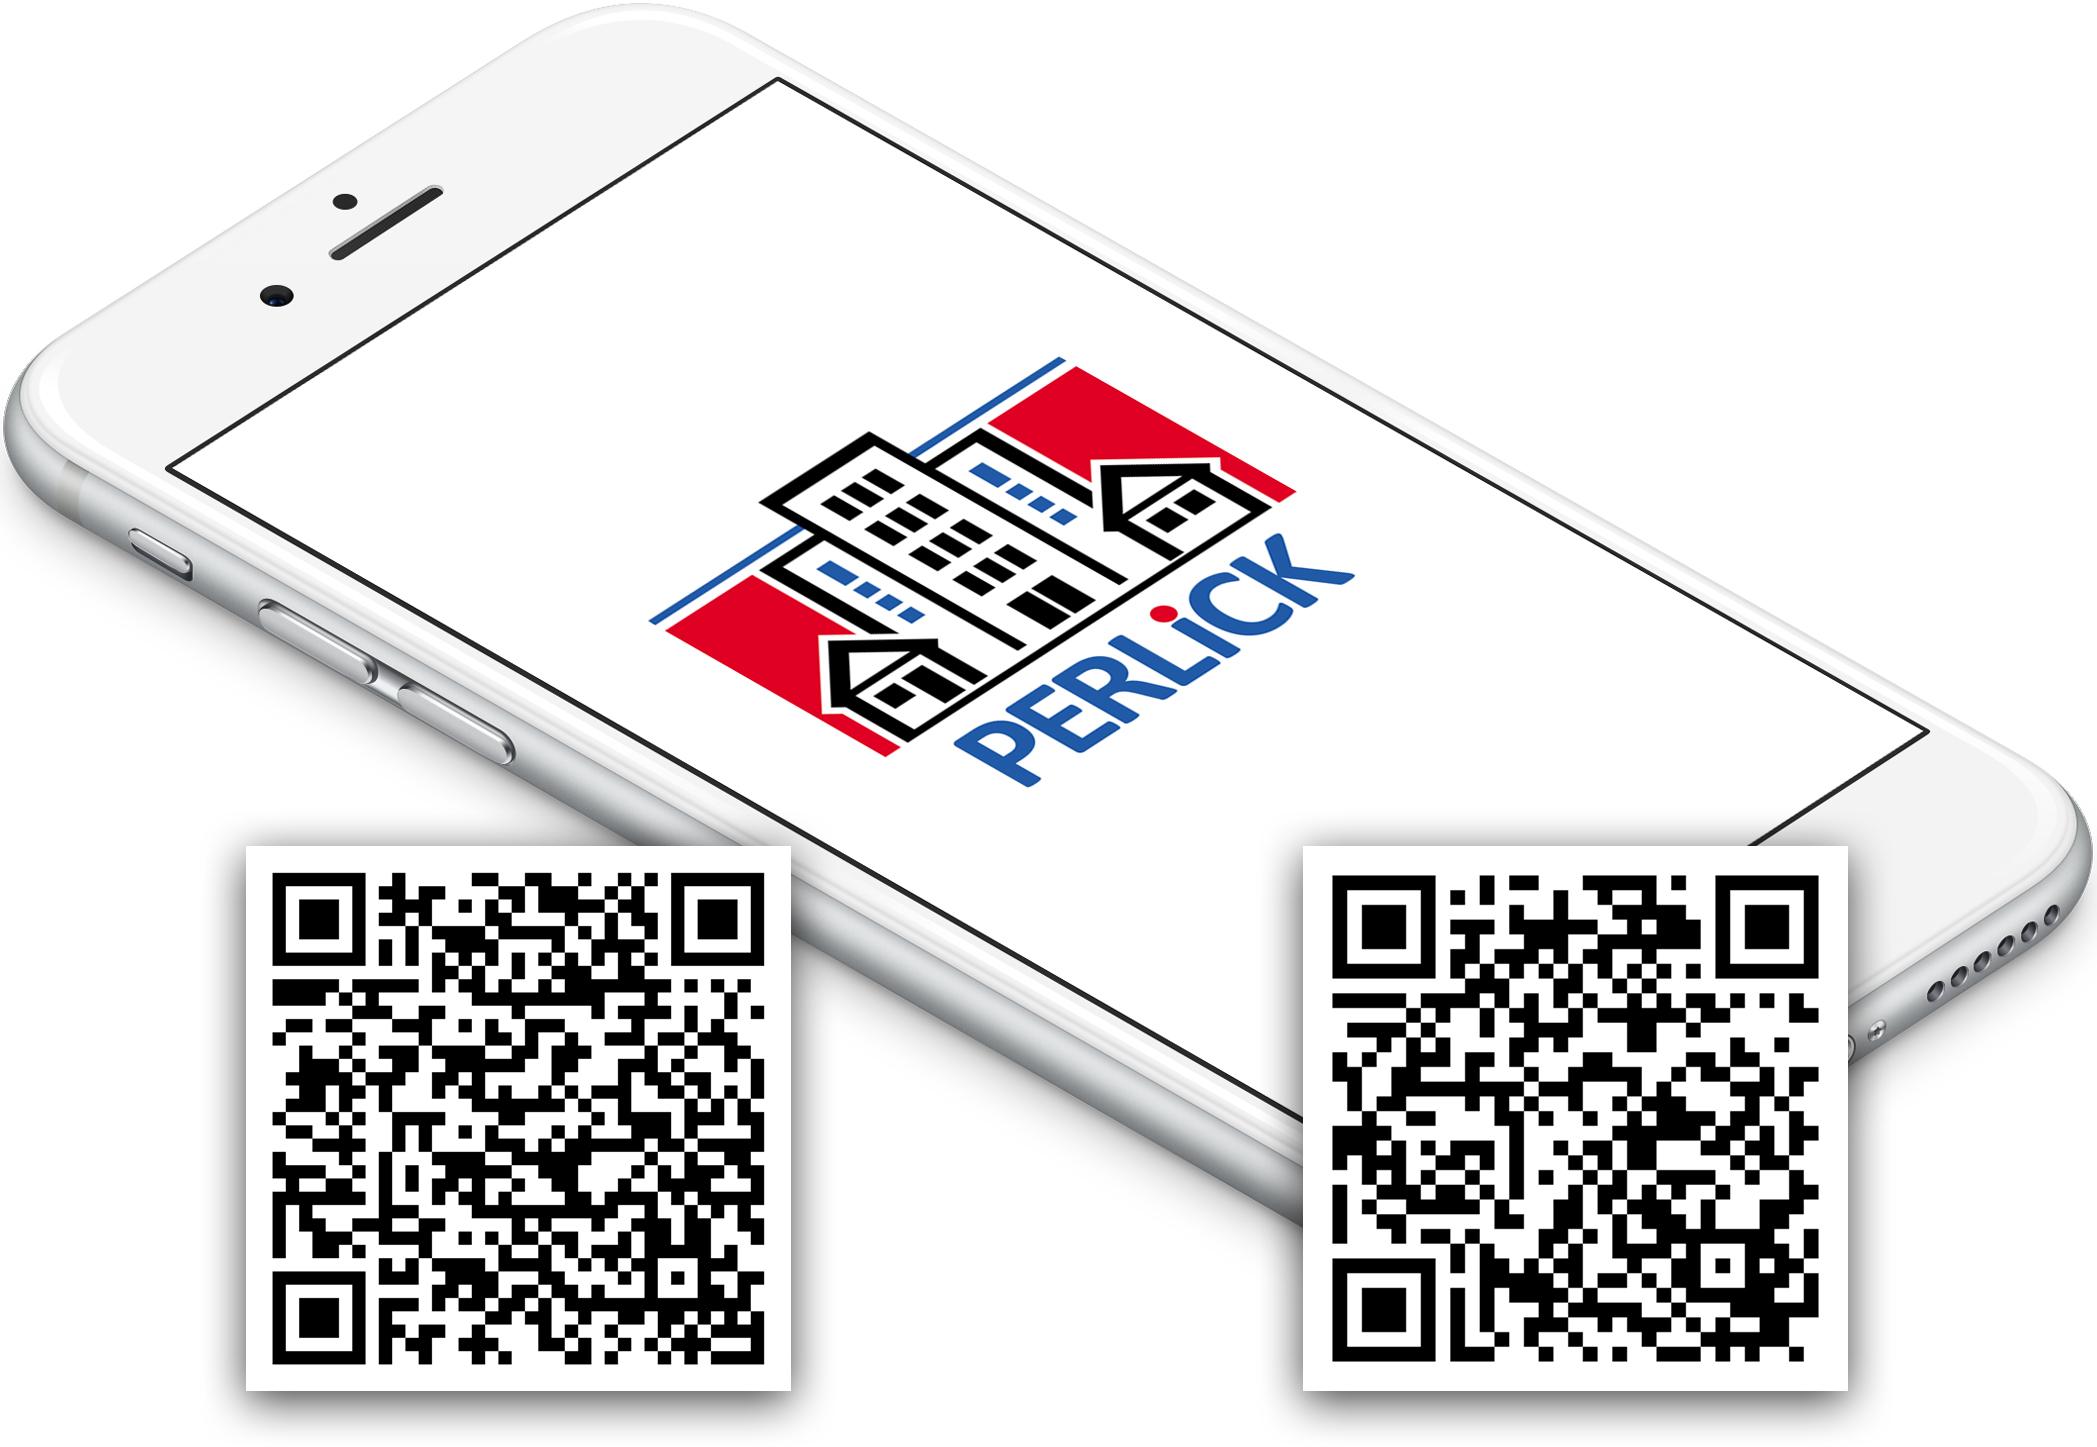 Perlick Service App